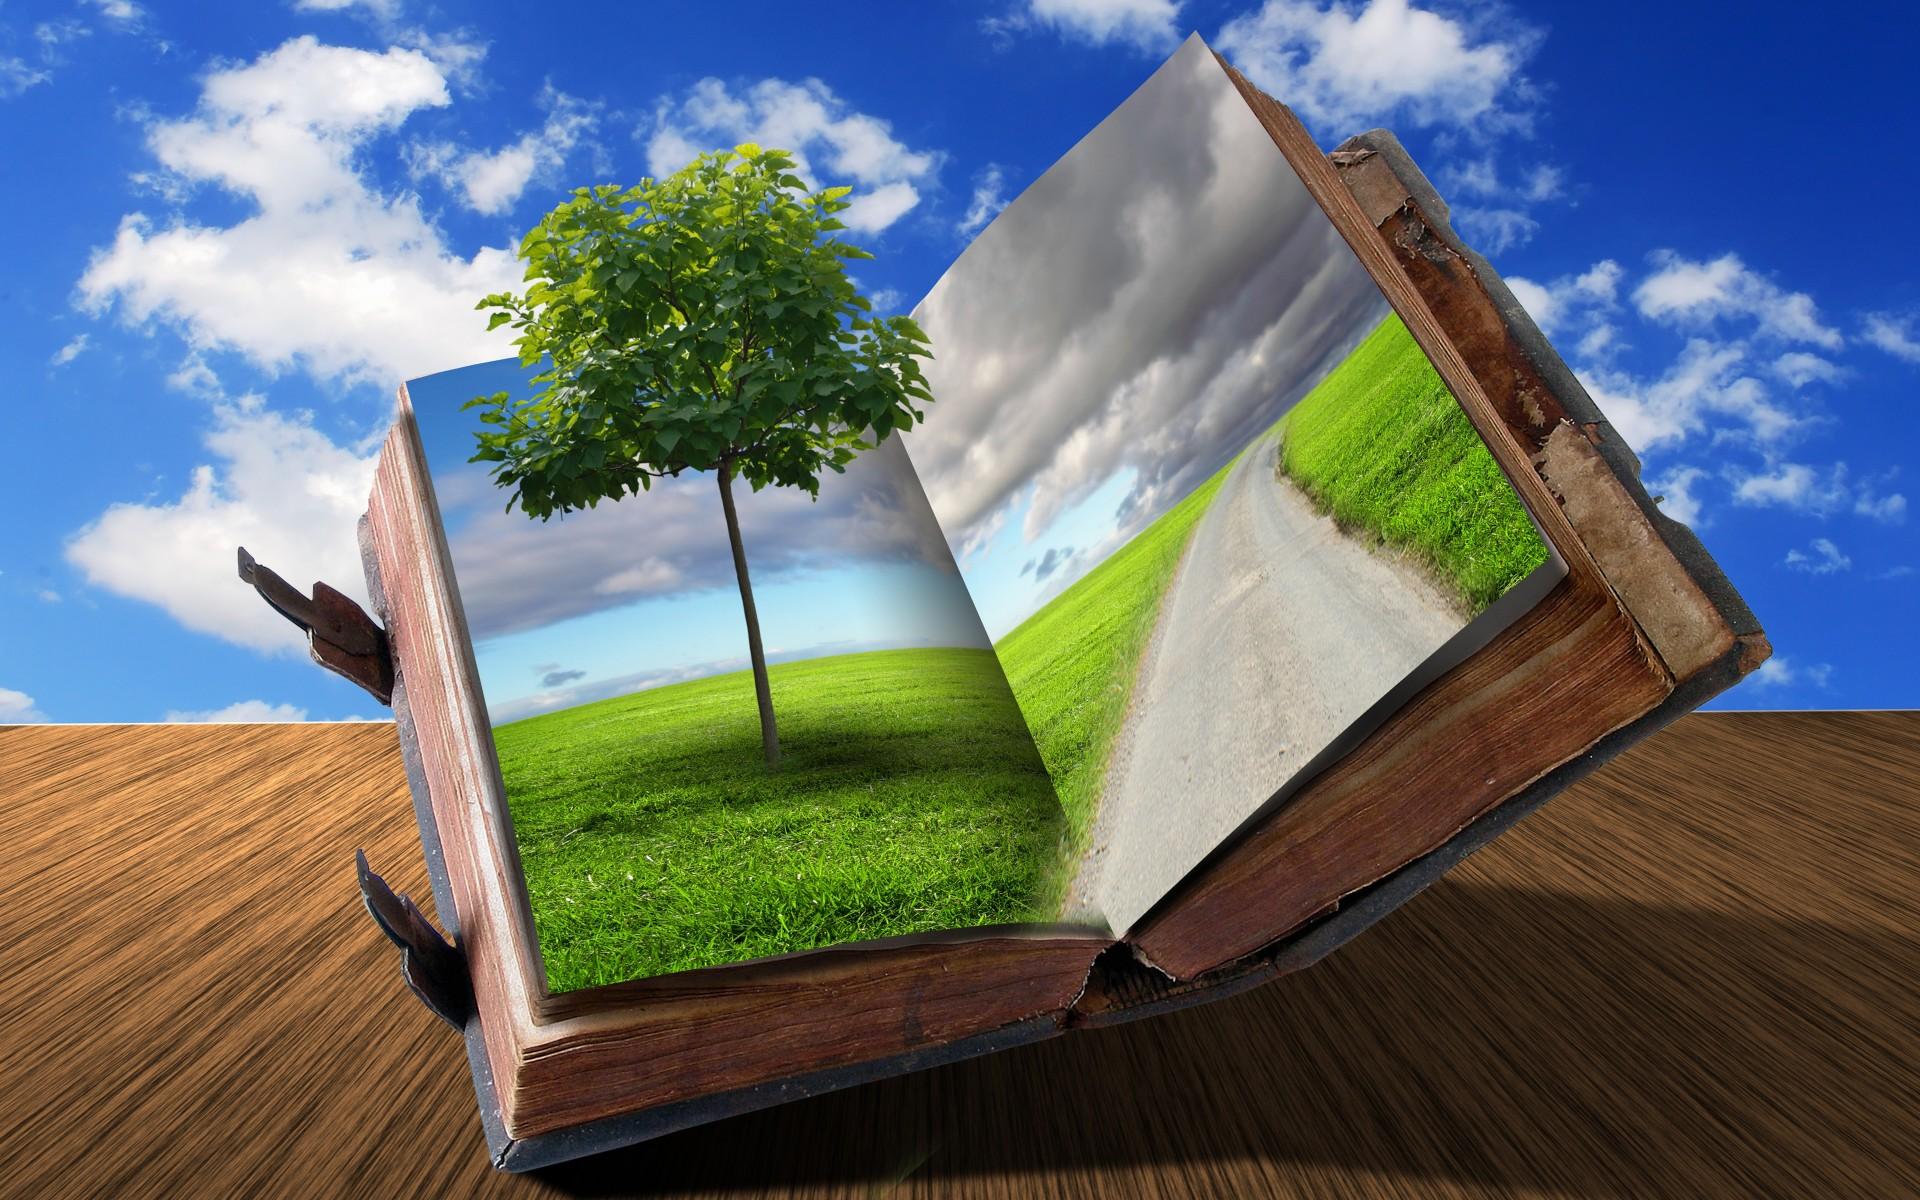 Cg digital art 3d books dream imagination nature ...